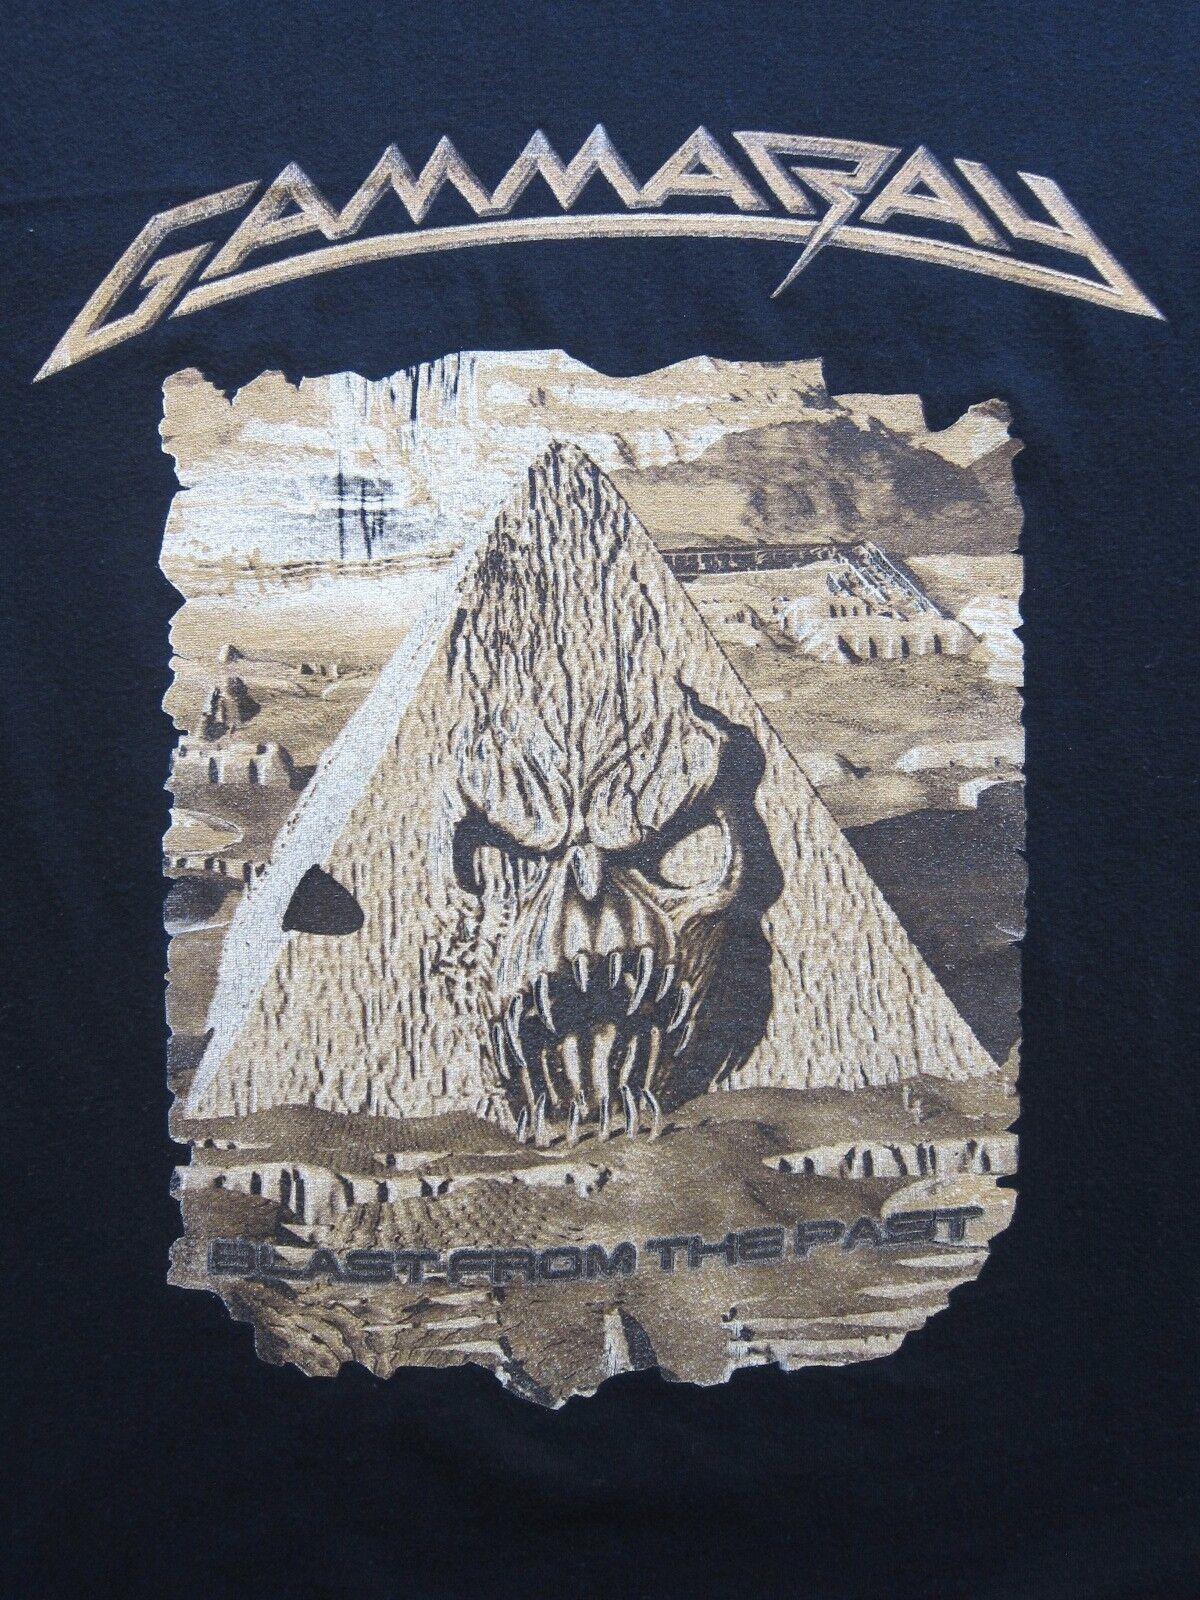 Vintage Gamma Ray Blast from the Past t-shirt 2000 death speed metal Größe L/XL